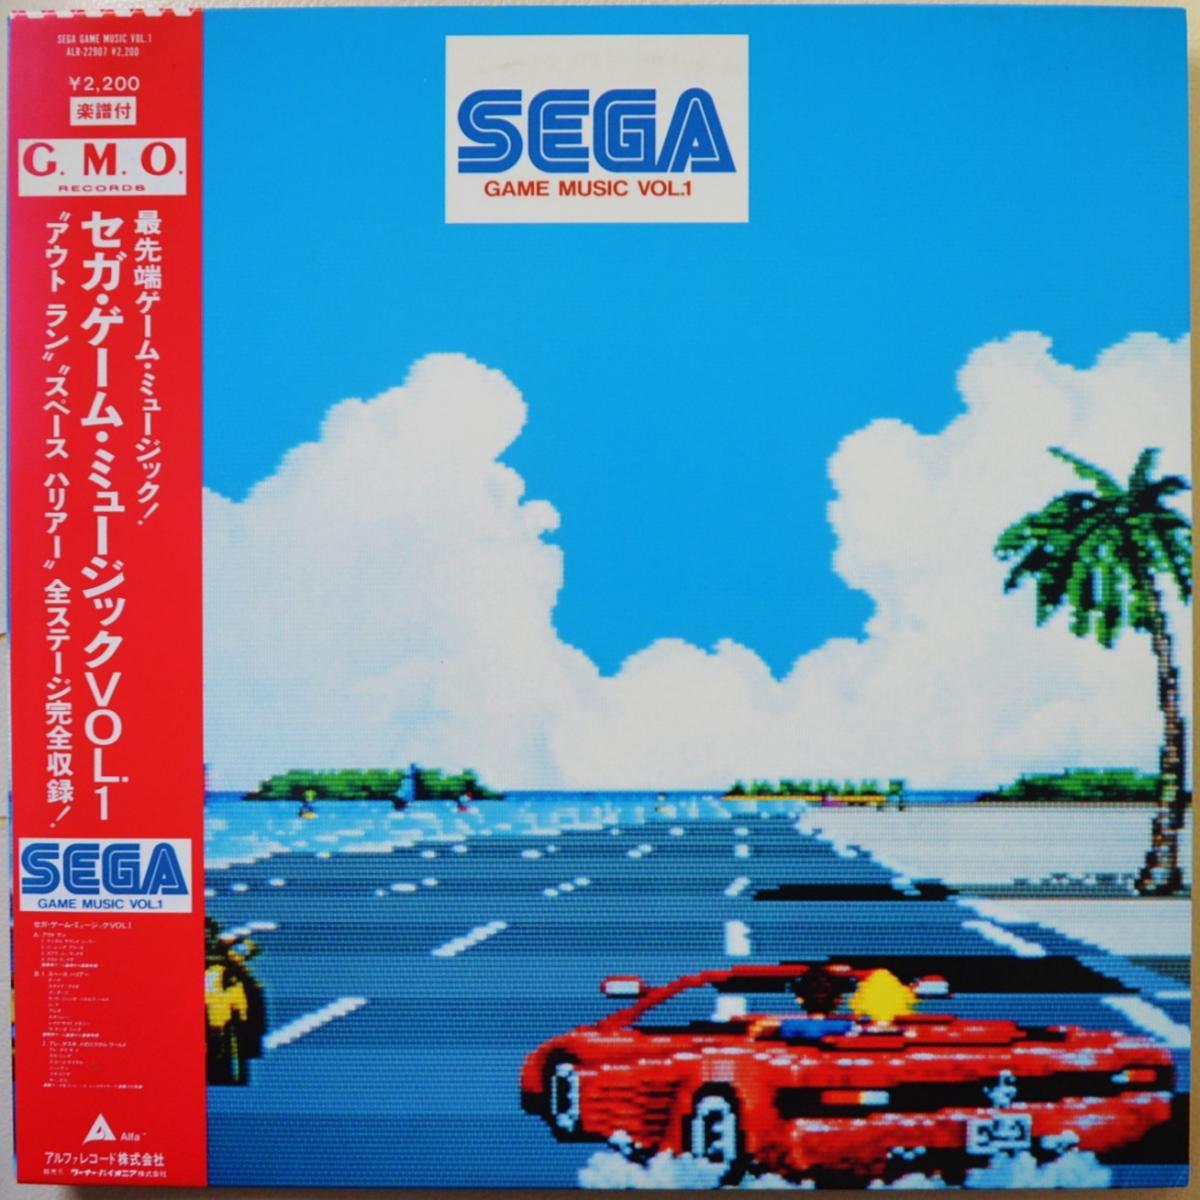 V.A. / セガ・ゲーム・ミュージック VOL.1 / SEGA GAME MUSIC VOL. 1 (LP)